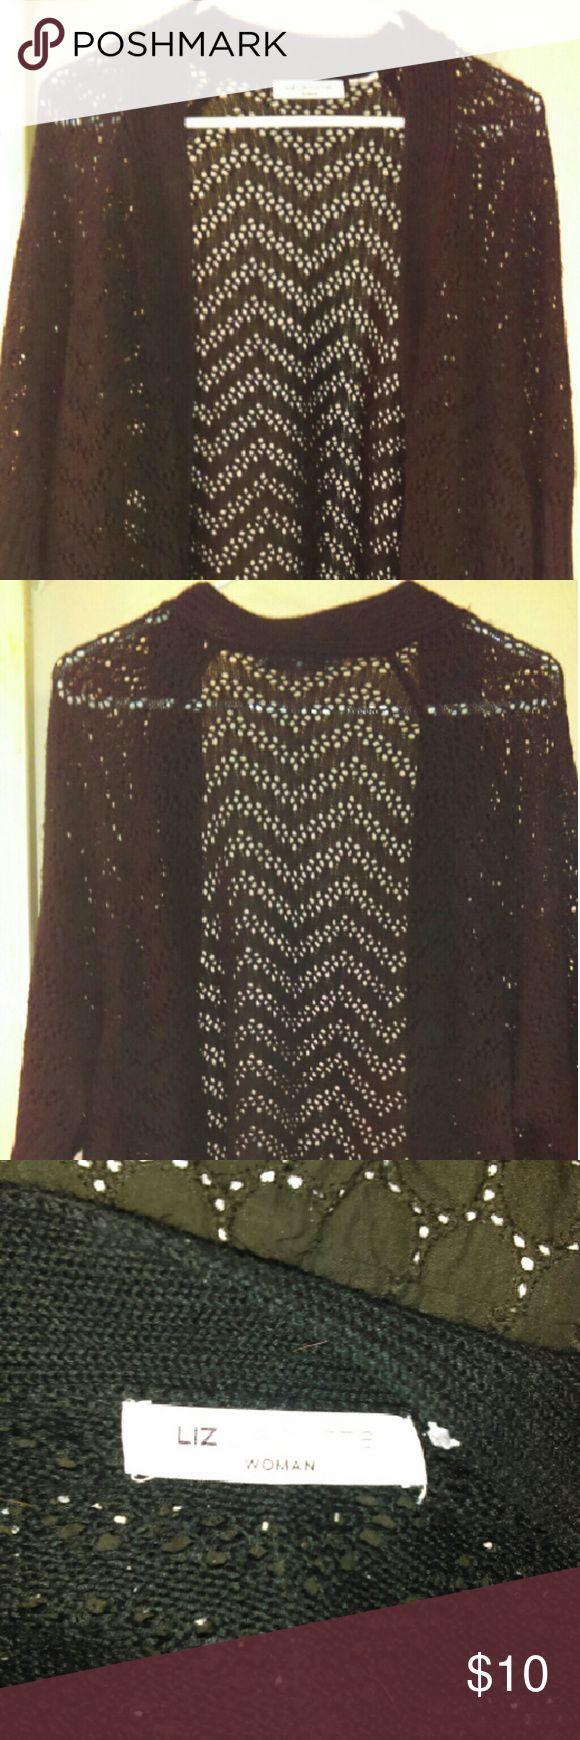 Liz Claiborne Crochet Shrug Liz Claiborne 3/4 Sleeve Crochet Shrug Liz Claiborne Sweaters Shrugs & Ponchos